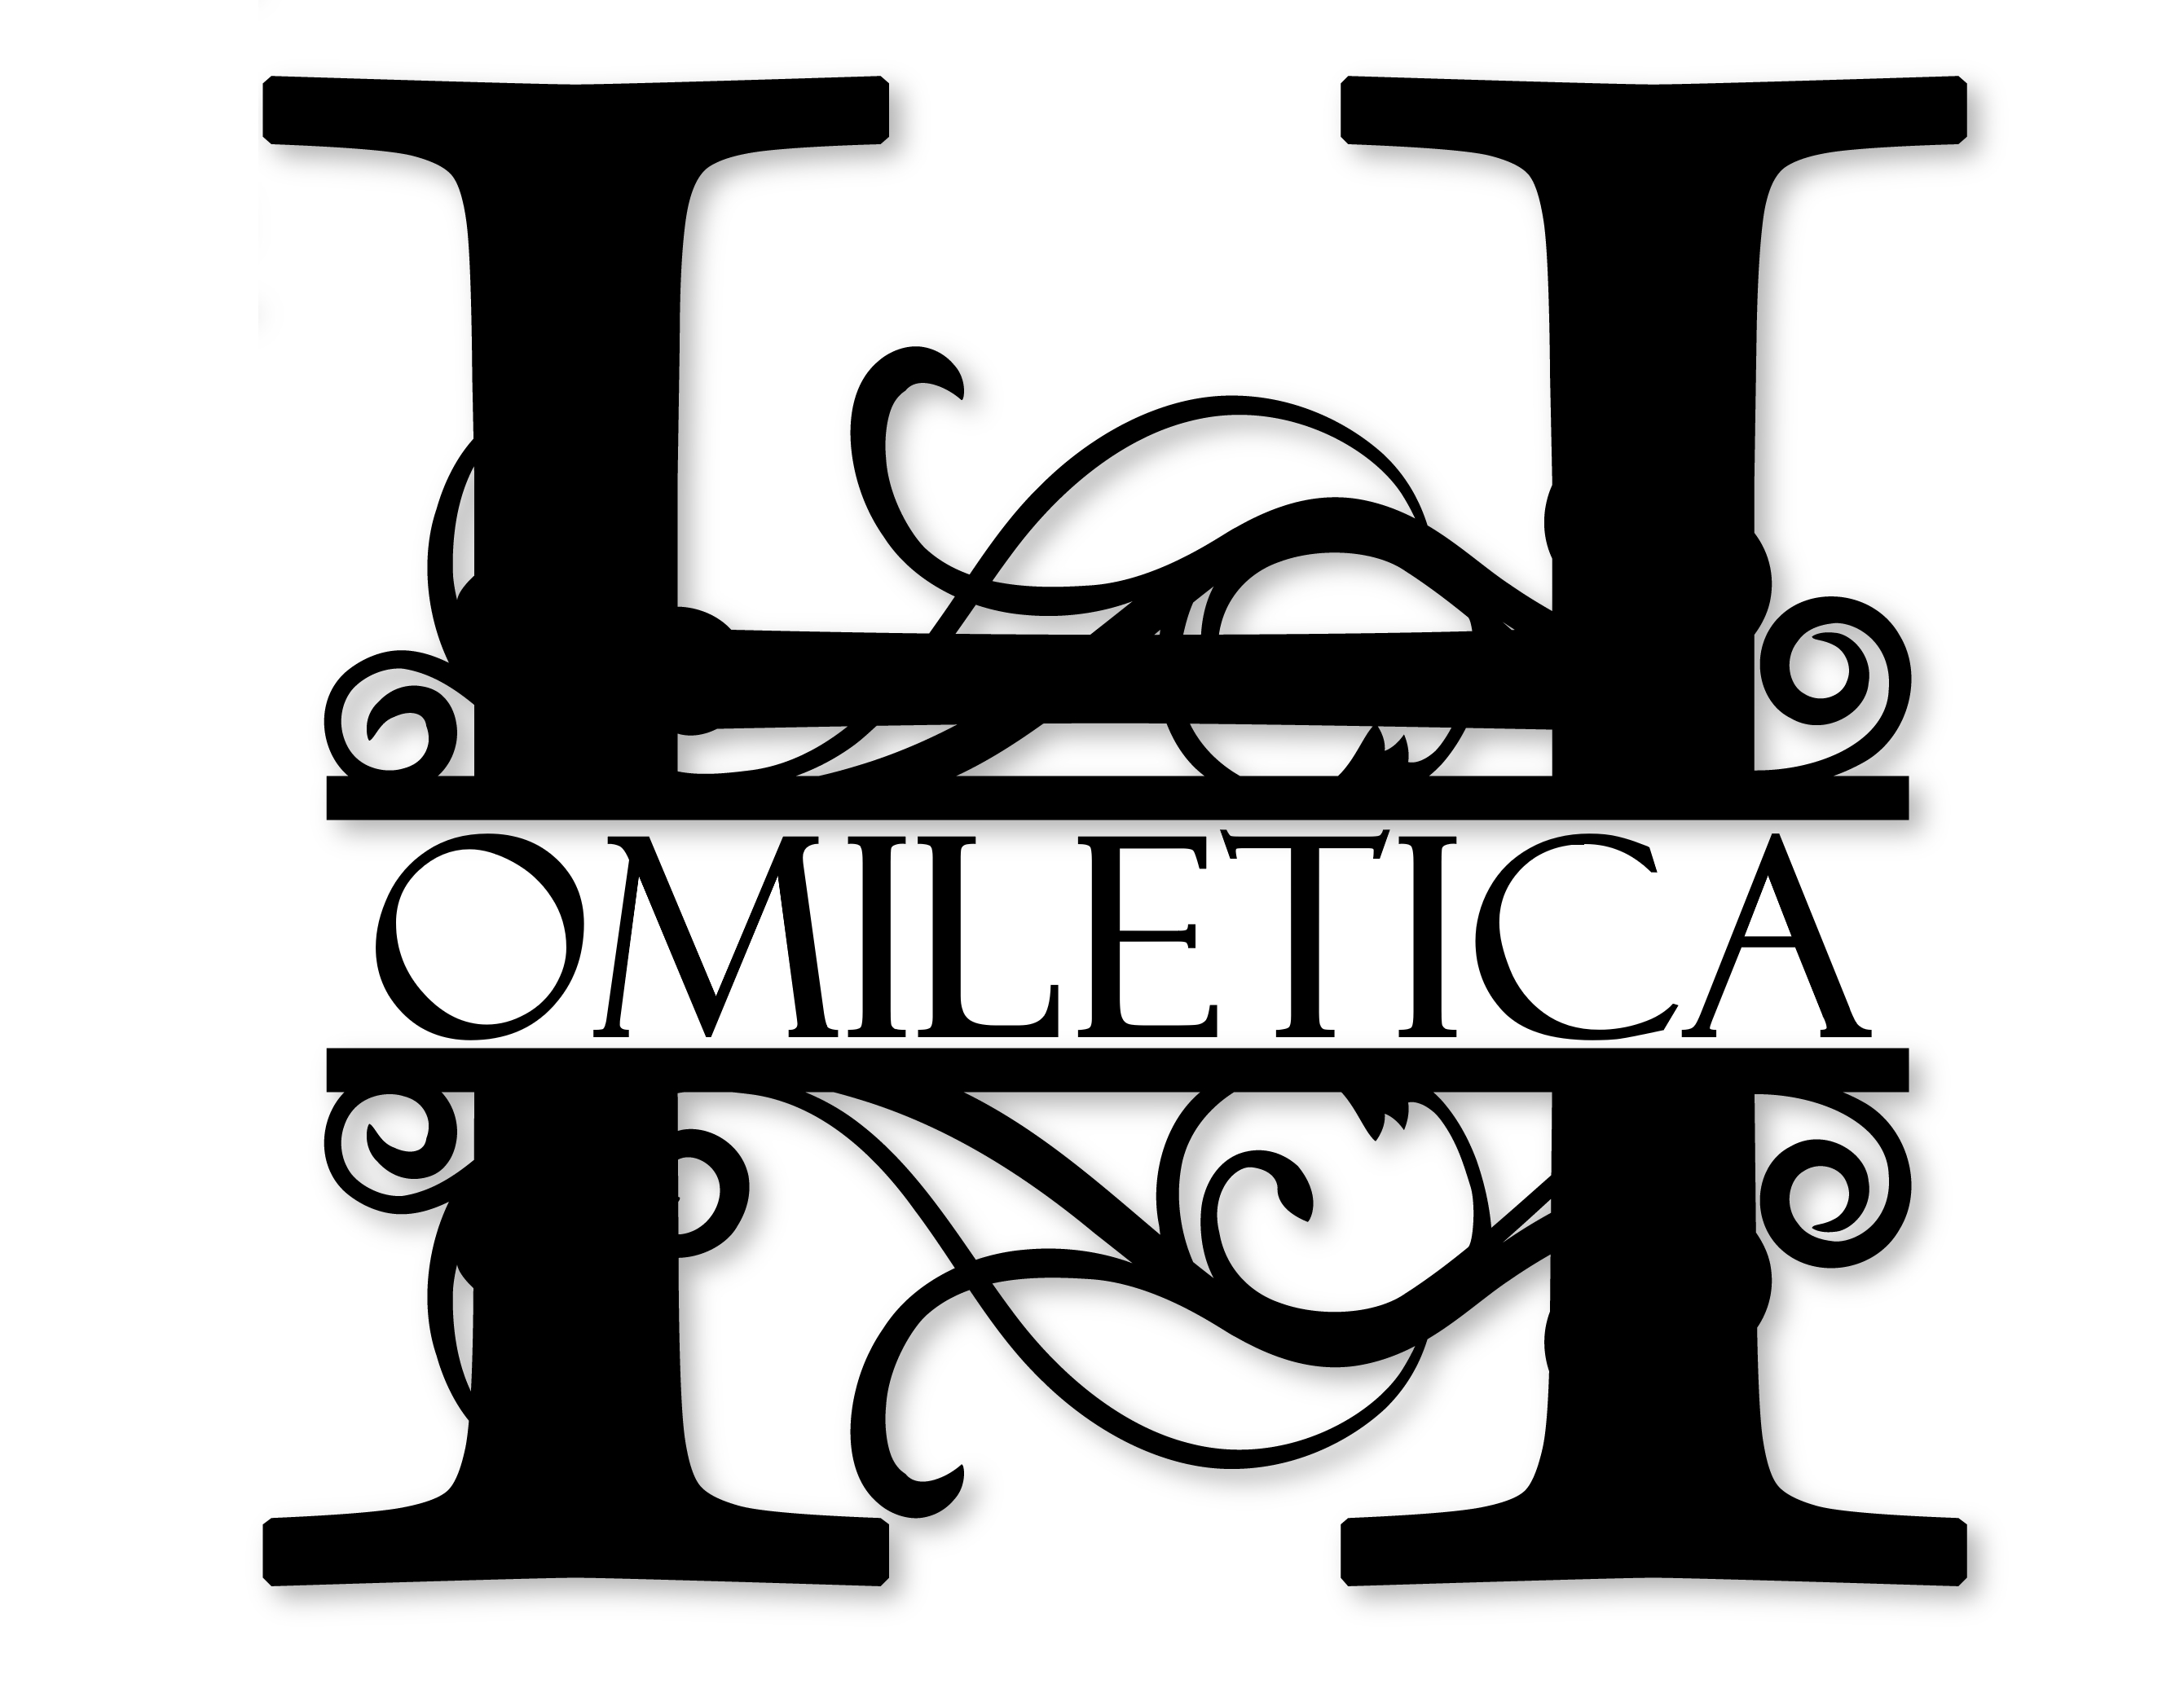 Homiletica-logo